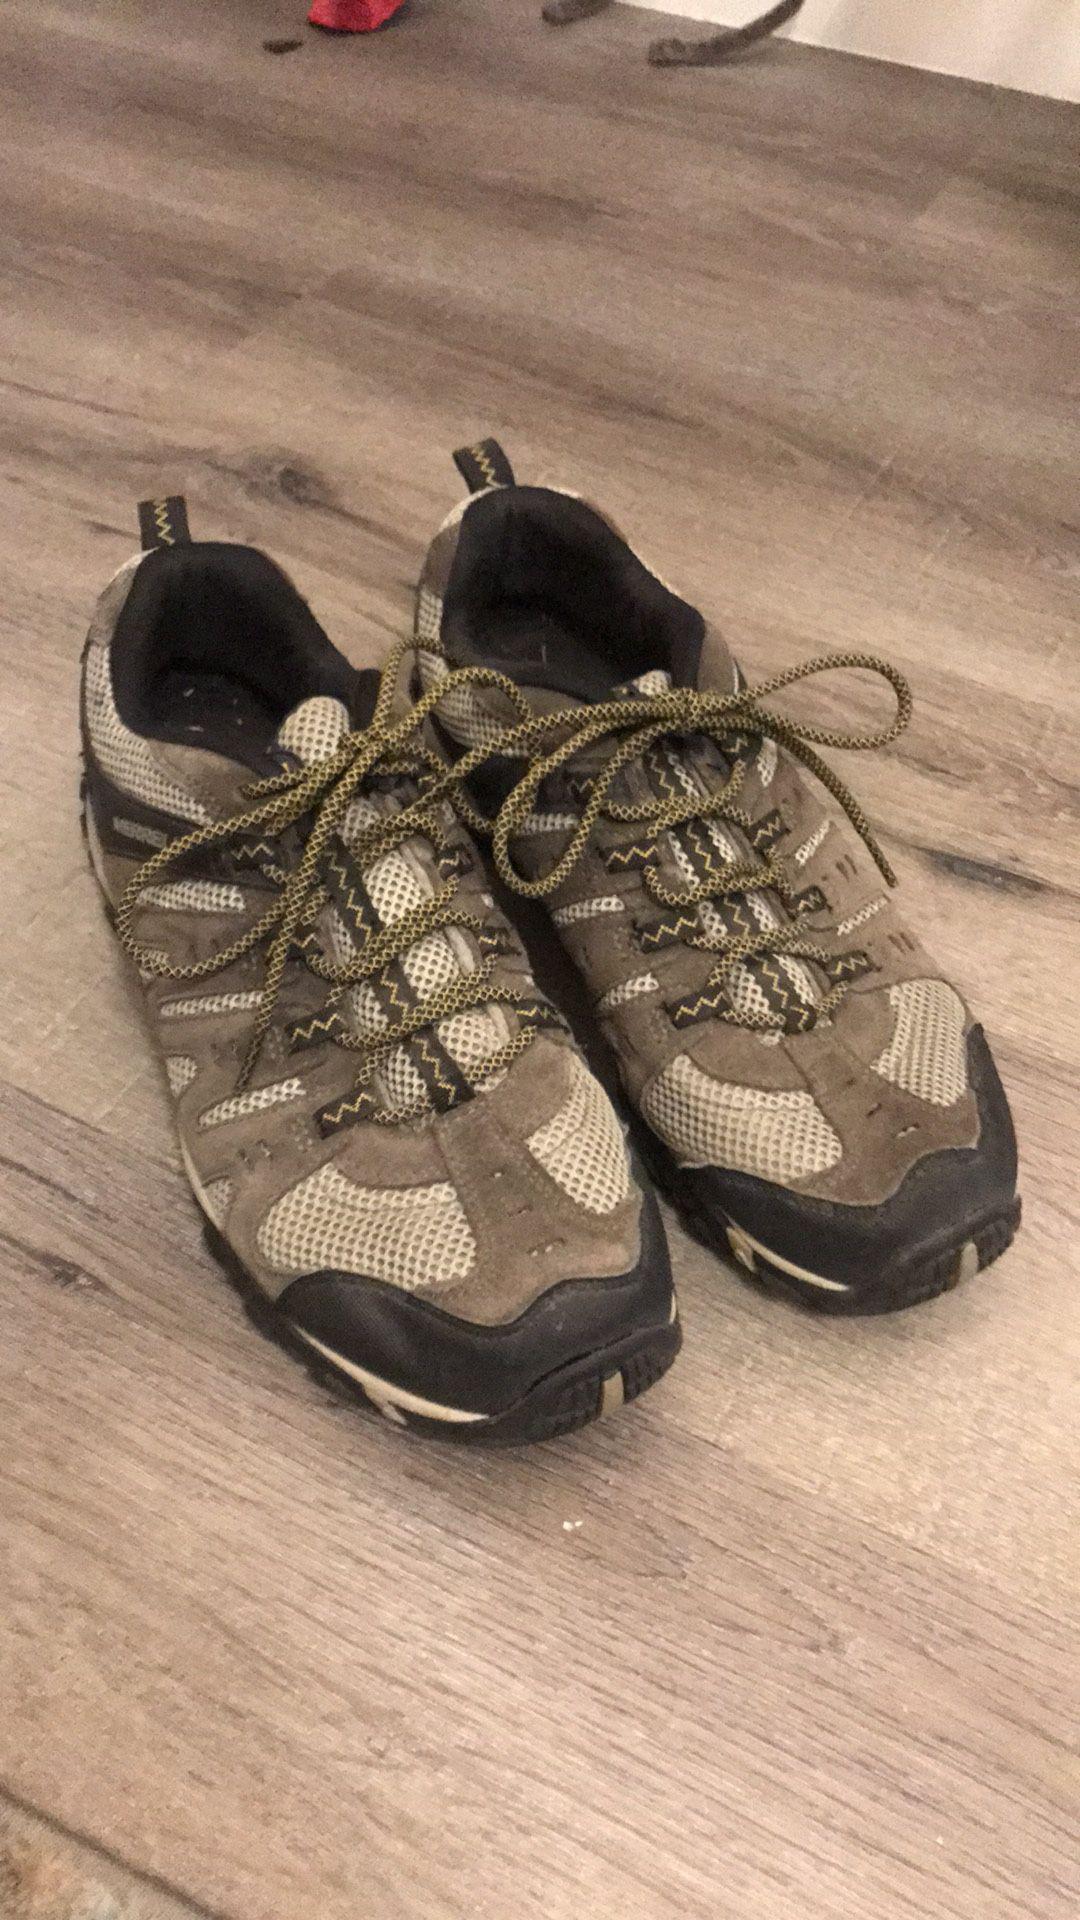 Men's Merrell Hiking Shoes